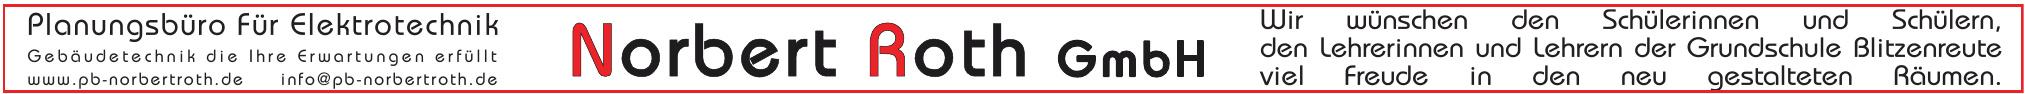 Norbert Roth GmbH